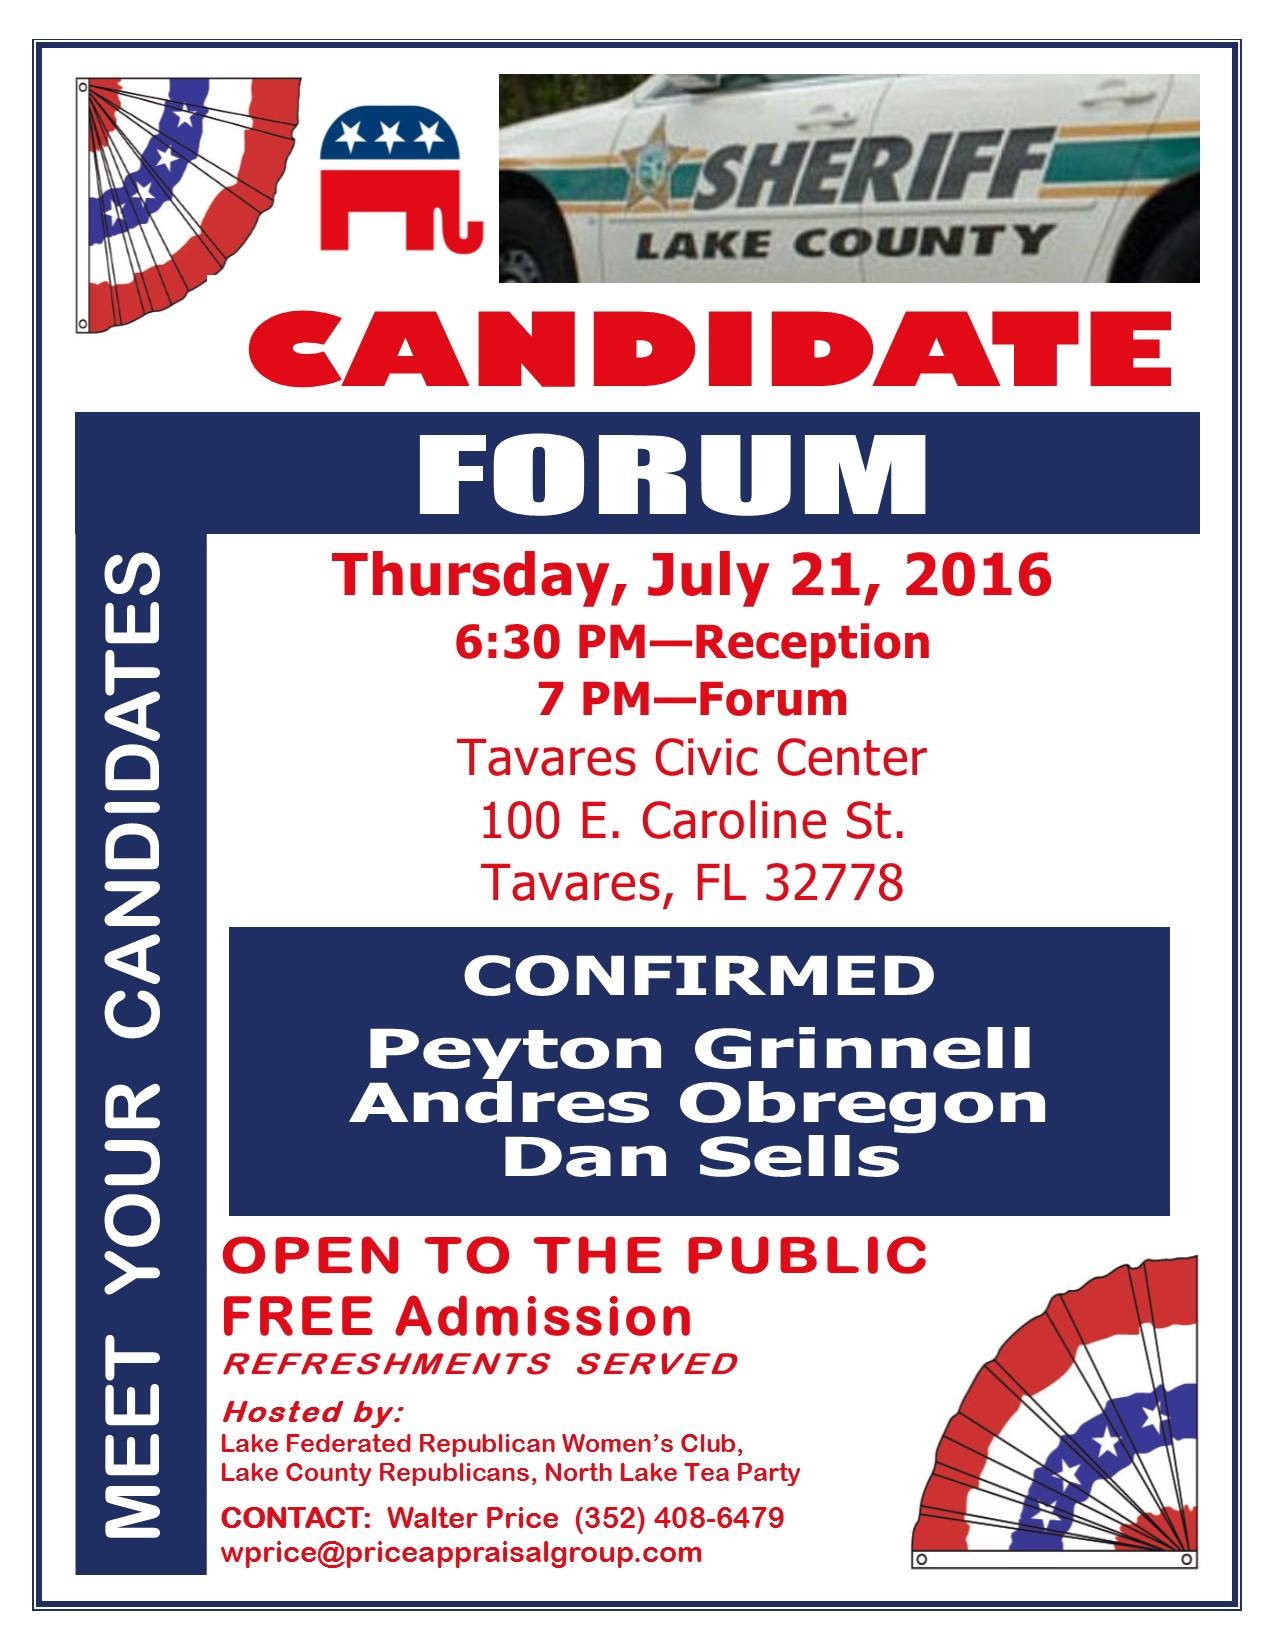 LC_Sheriff_Candidate_Forum_20160721.jpg